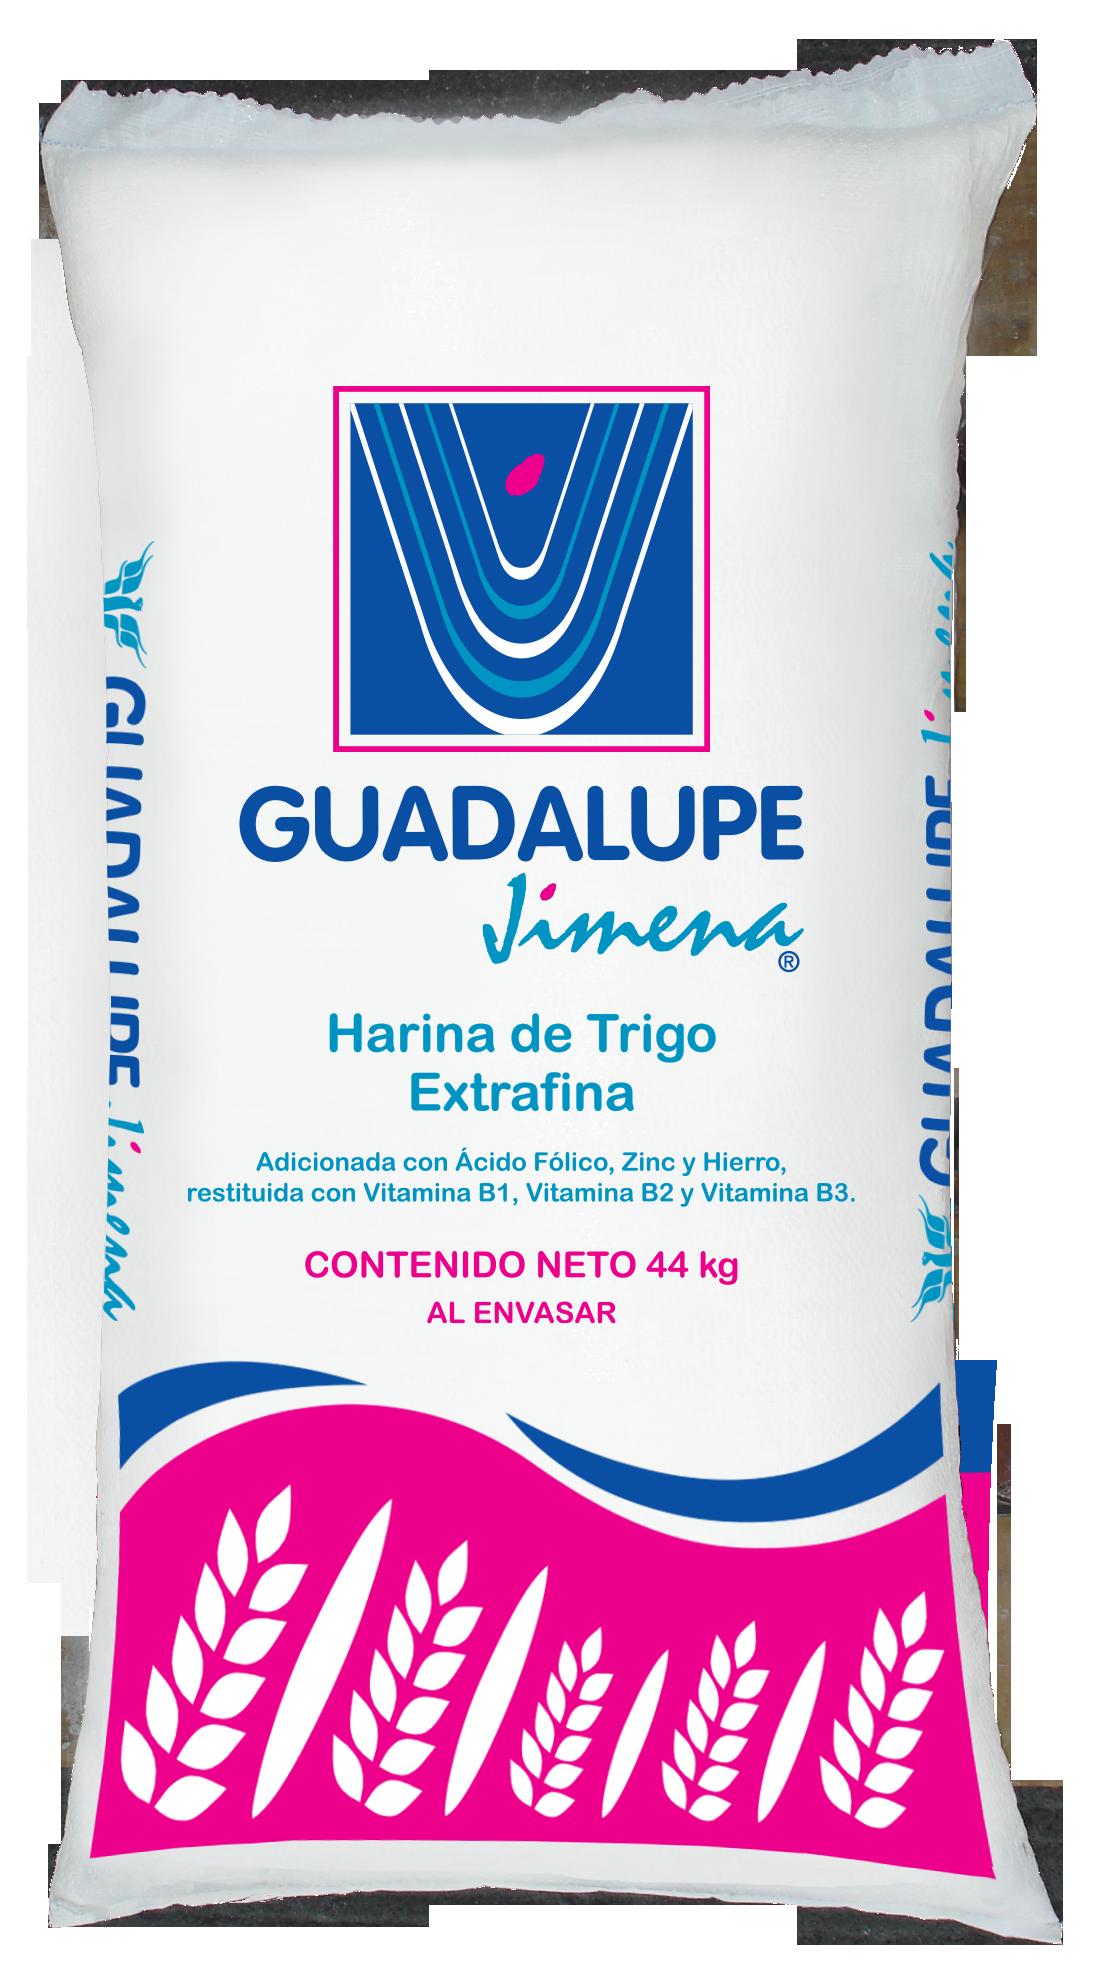 Harina de Trigo Guadalupe Jimena